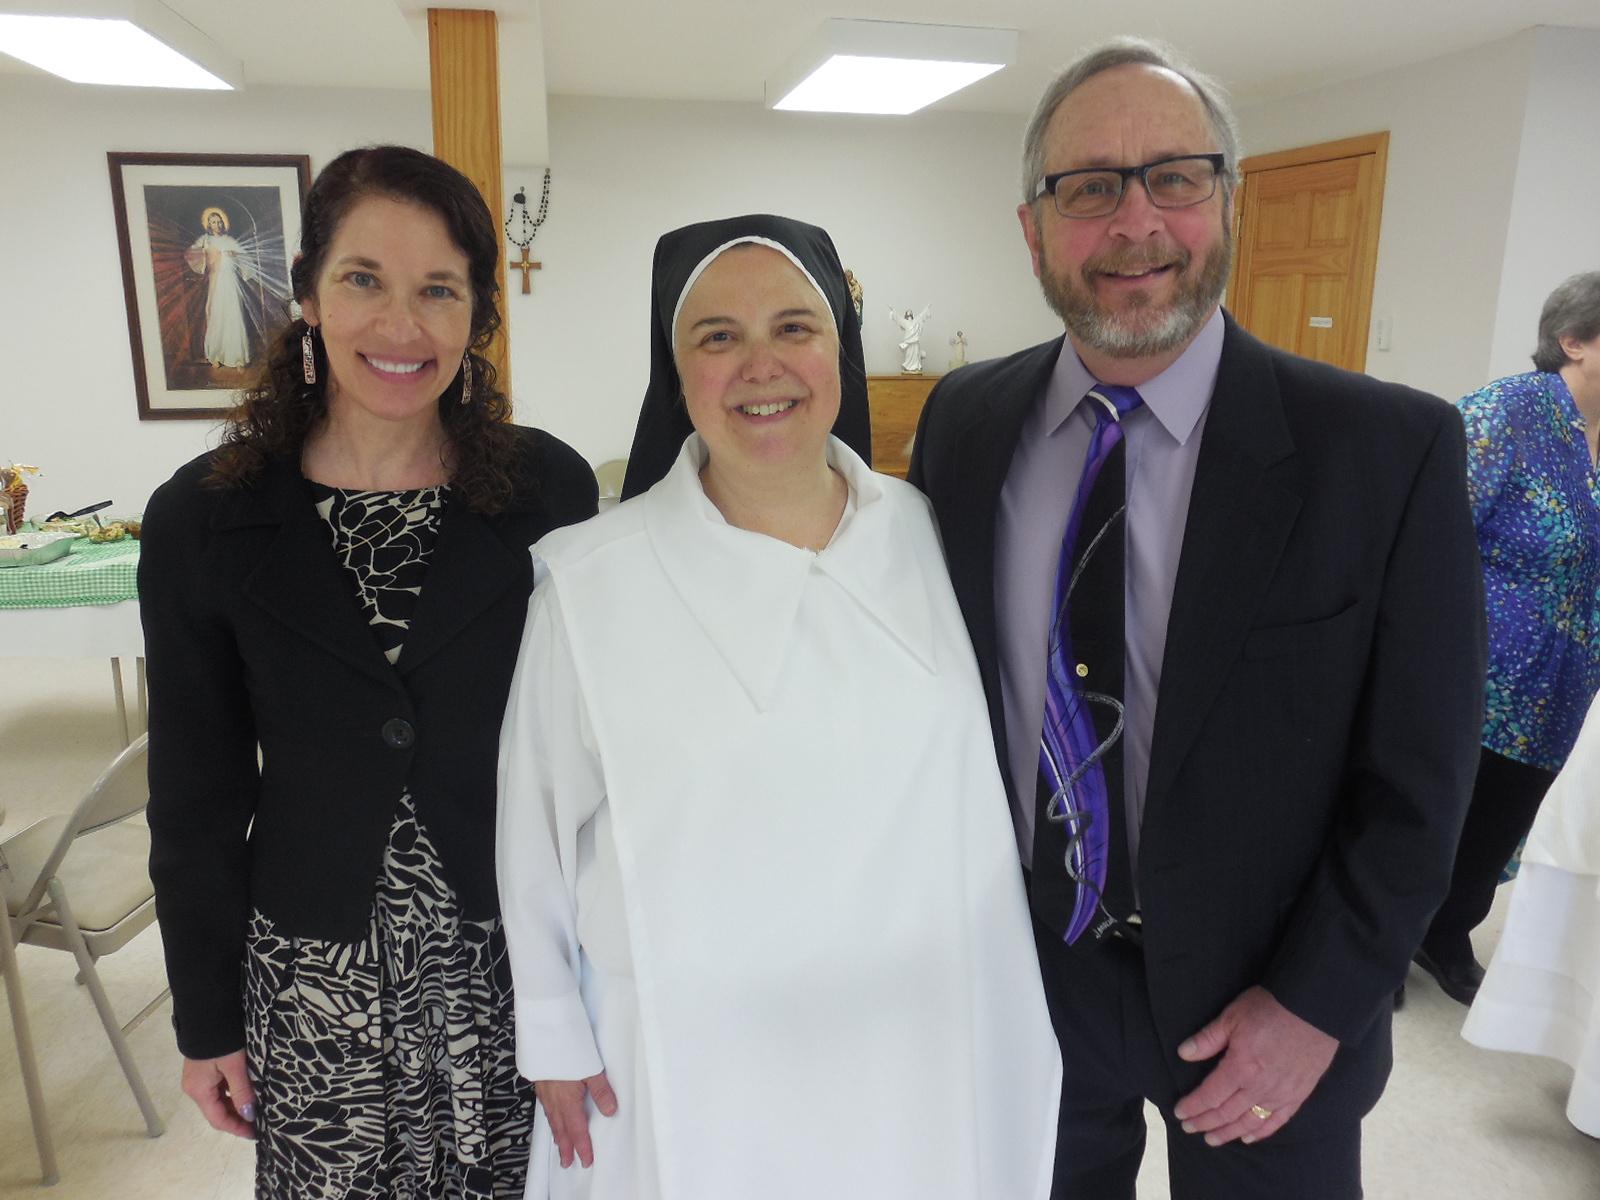 Sr. Maria Veronica of Divine Mercy